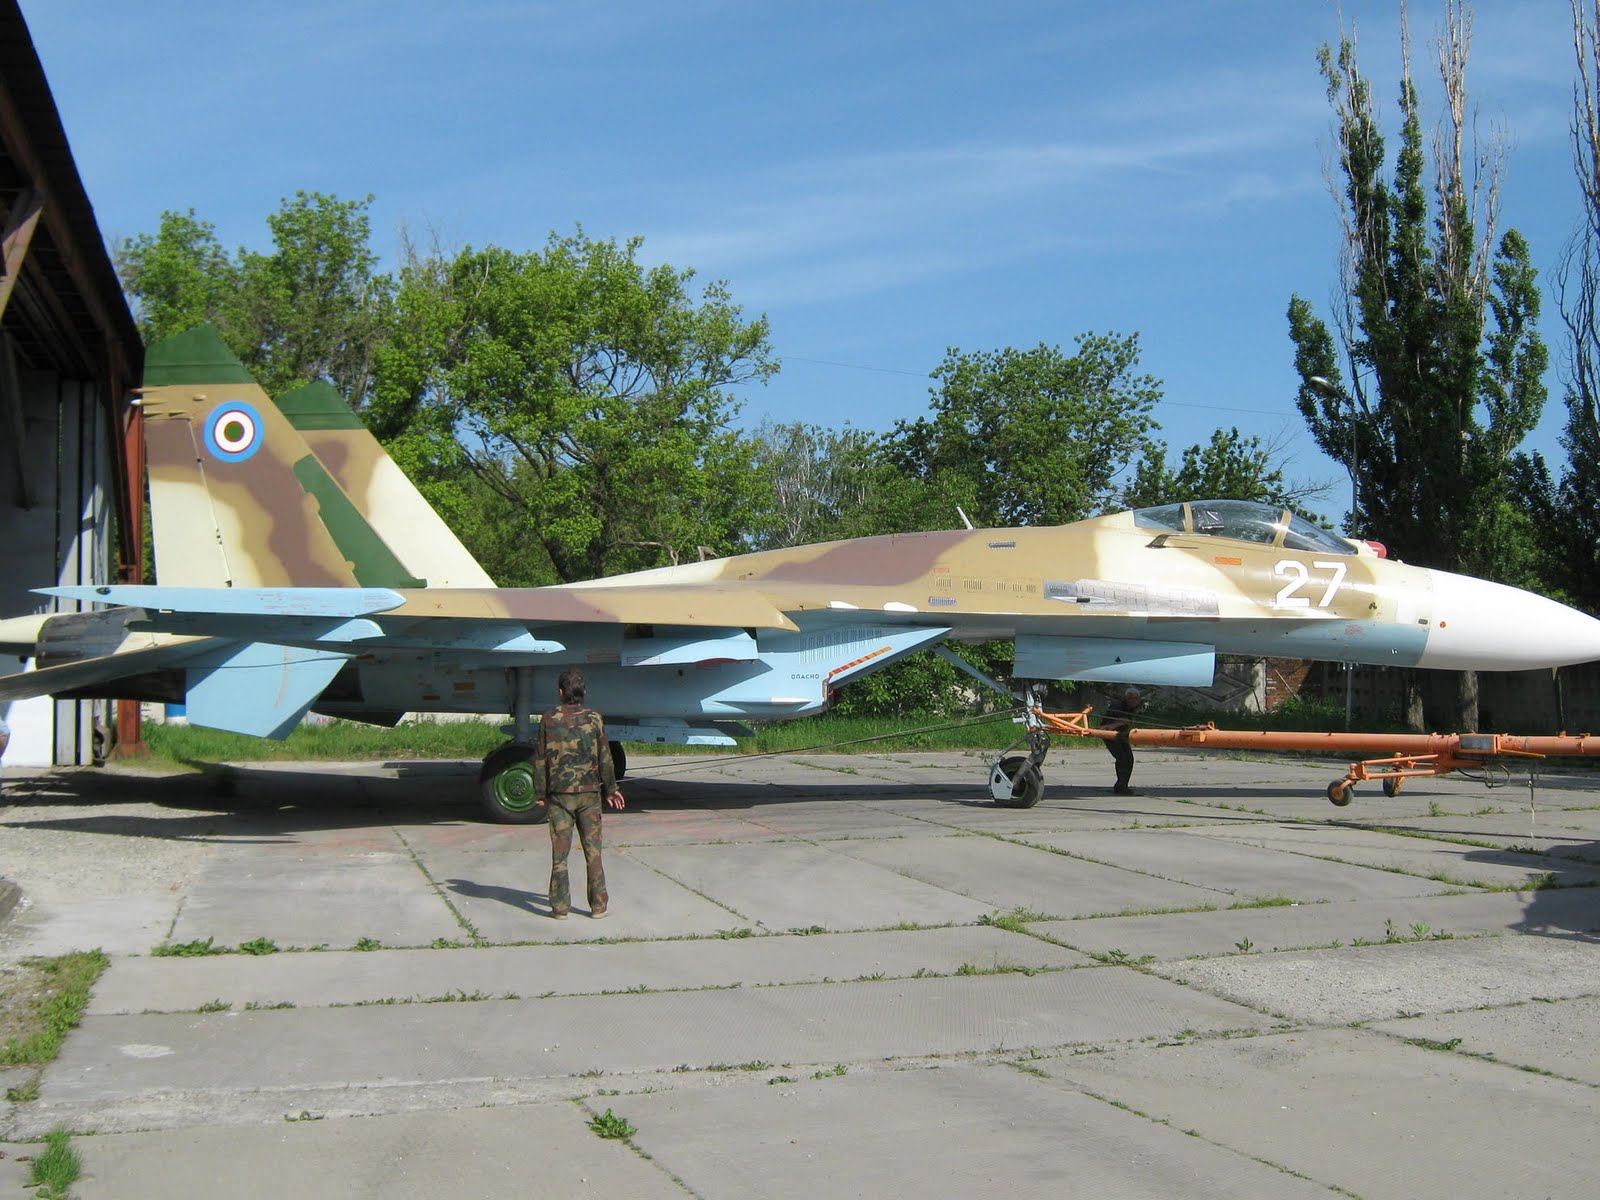 Armée Ouzbek / Uzbekistan's armed forces SU-27%2B27%2BUZBEKISTAN